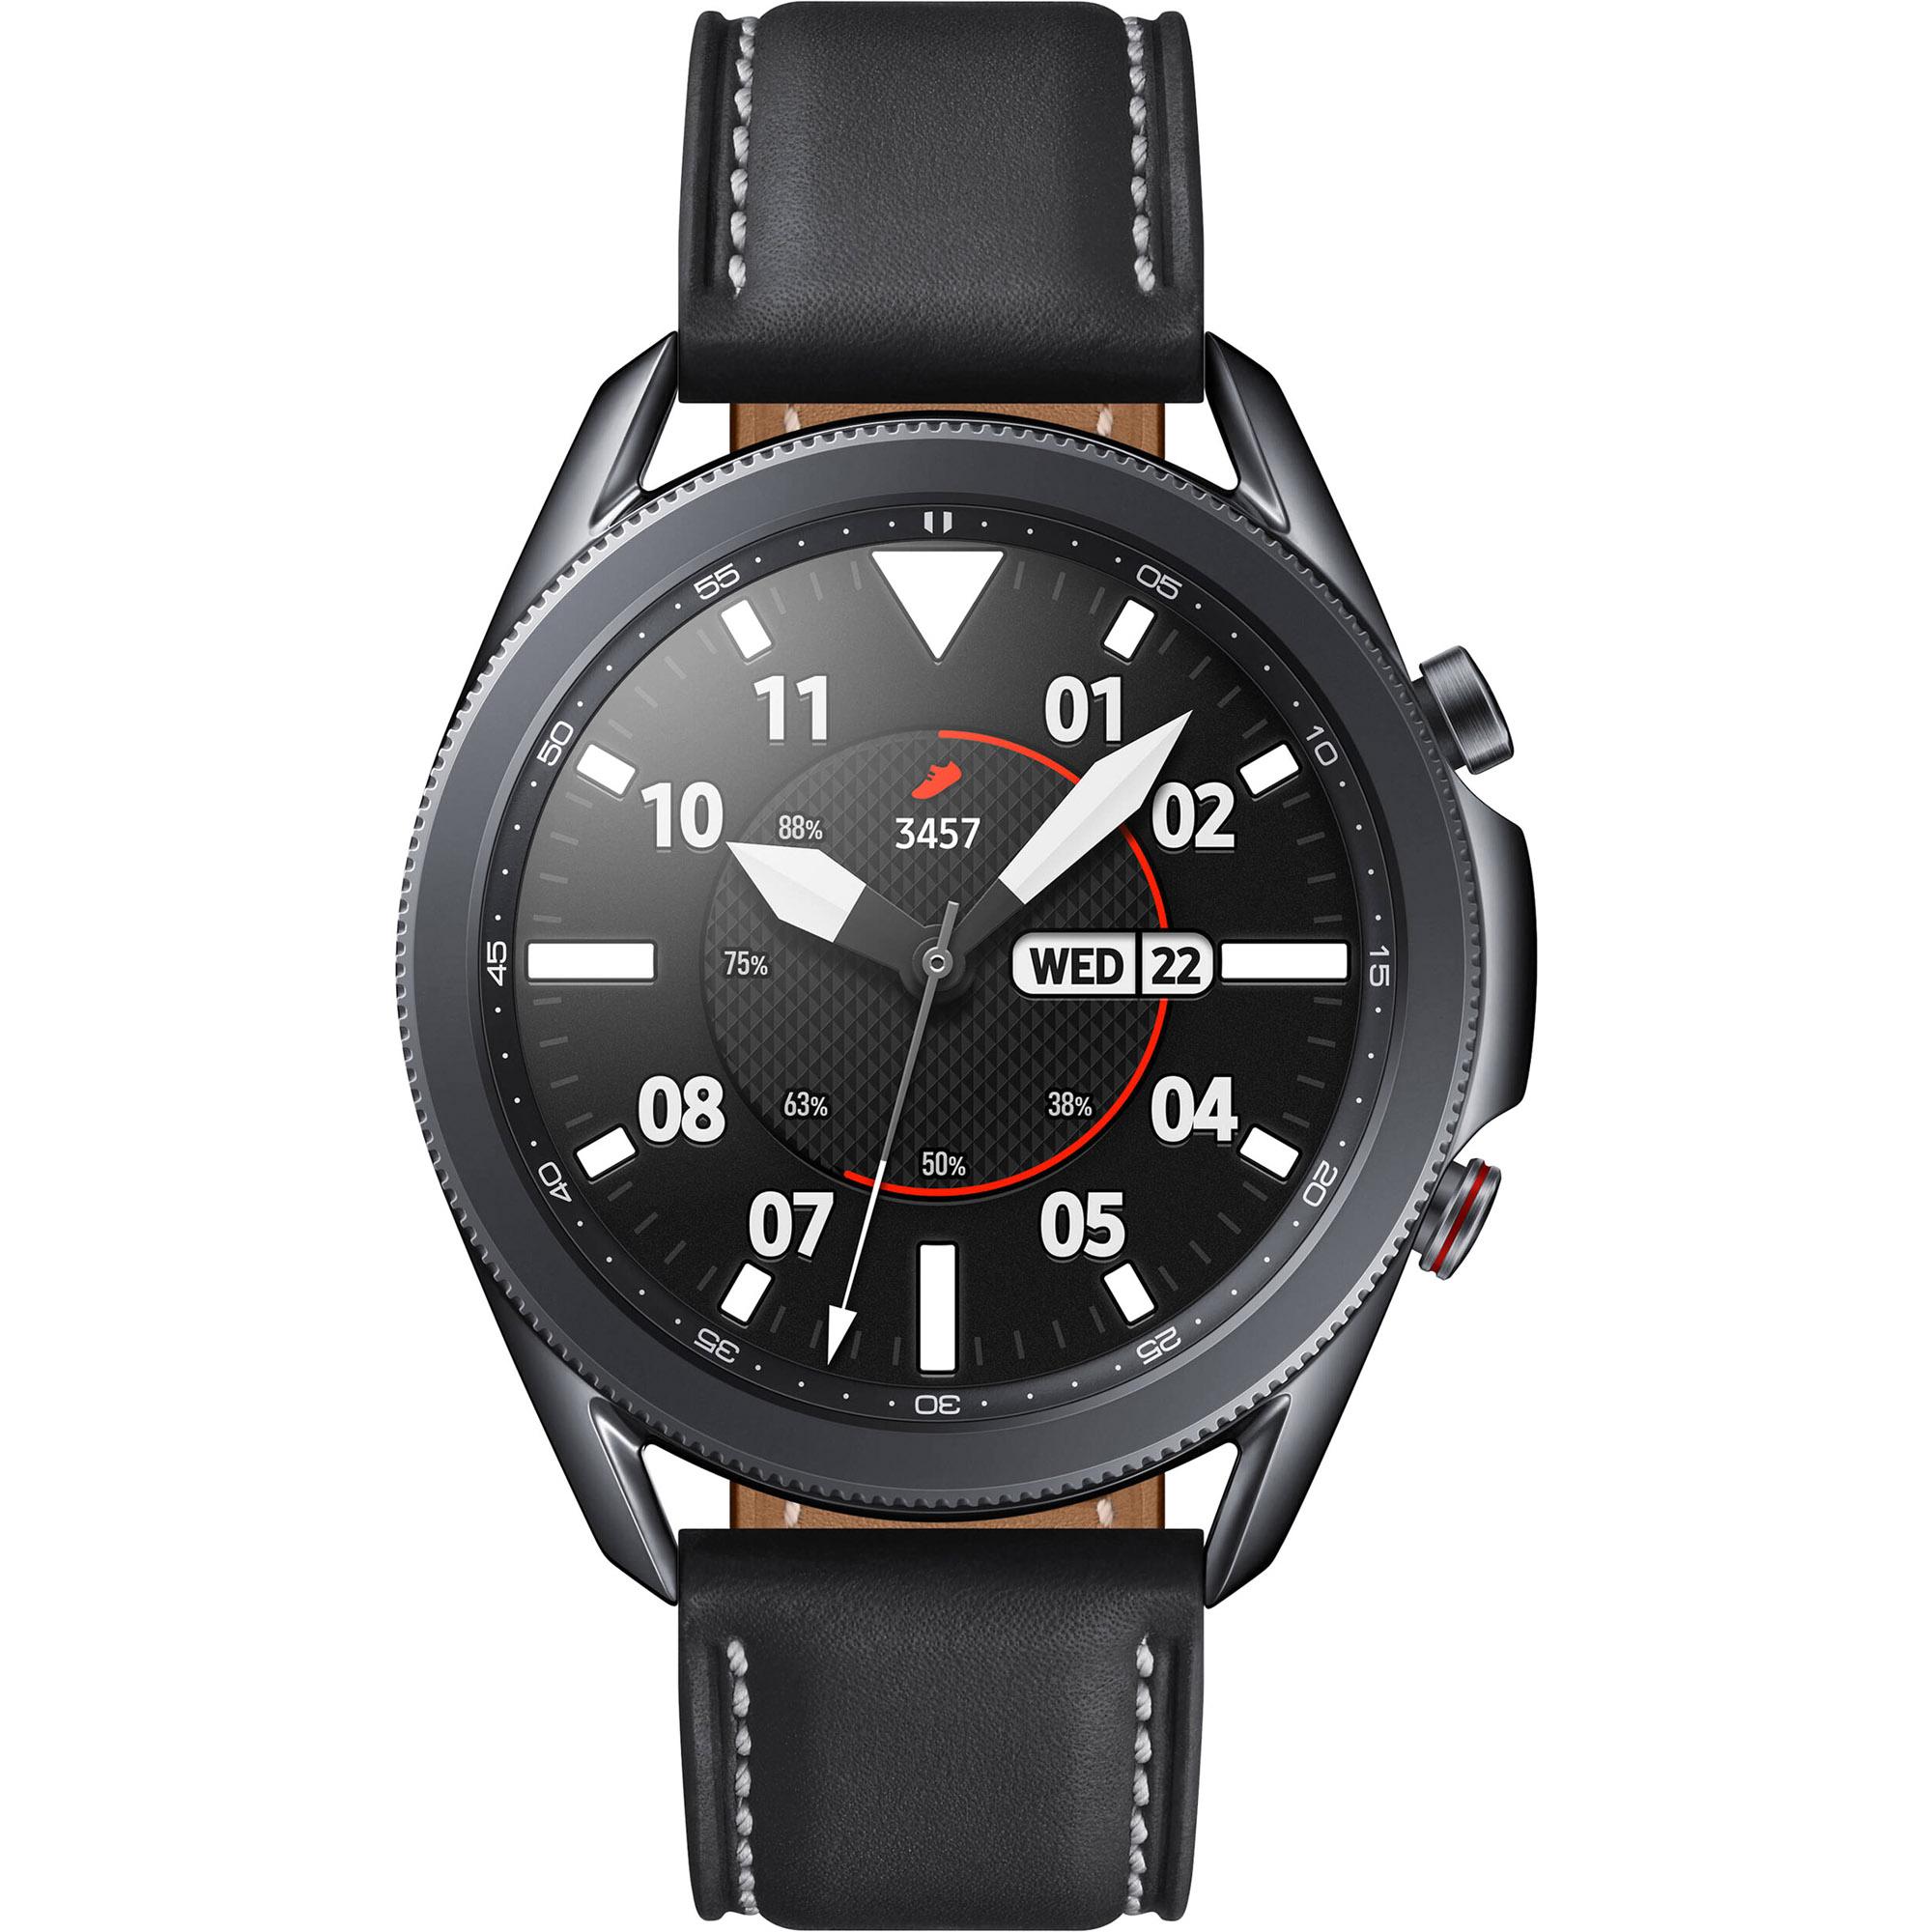 Смарт-часы Samsung Galaxy Watch3 45 мм (SM-R840NZKACIS) Черный